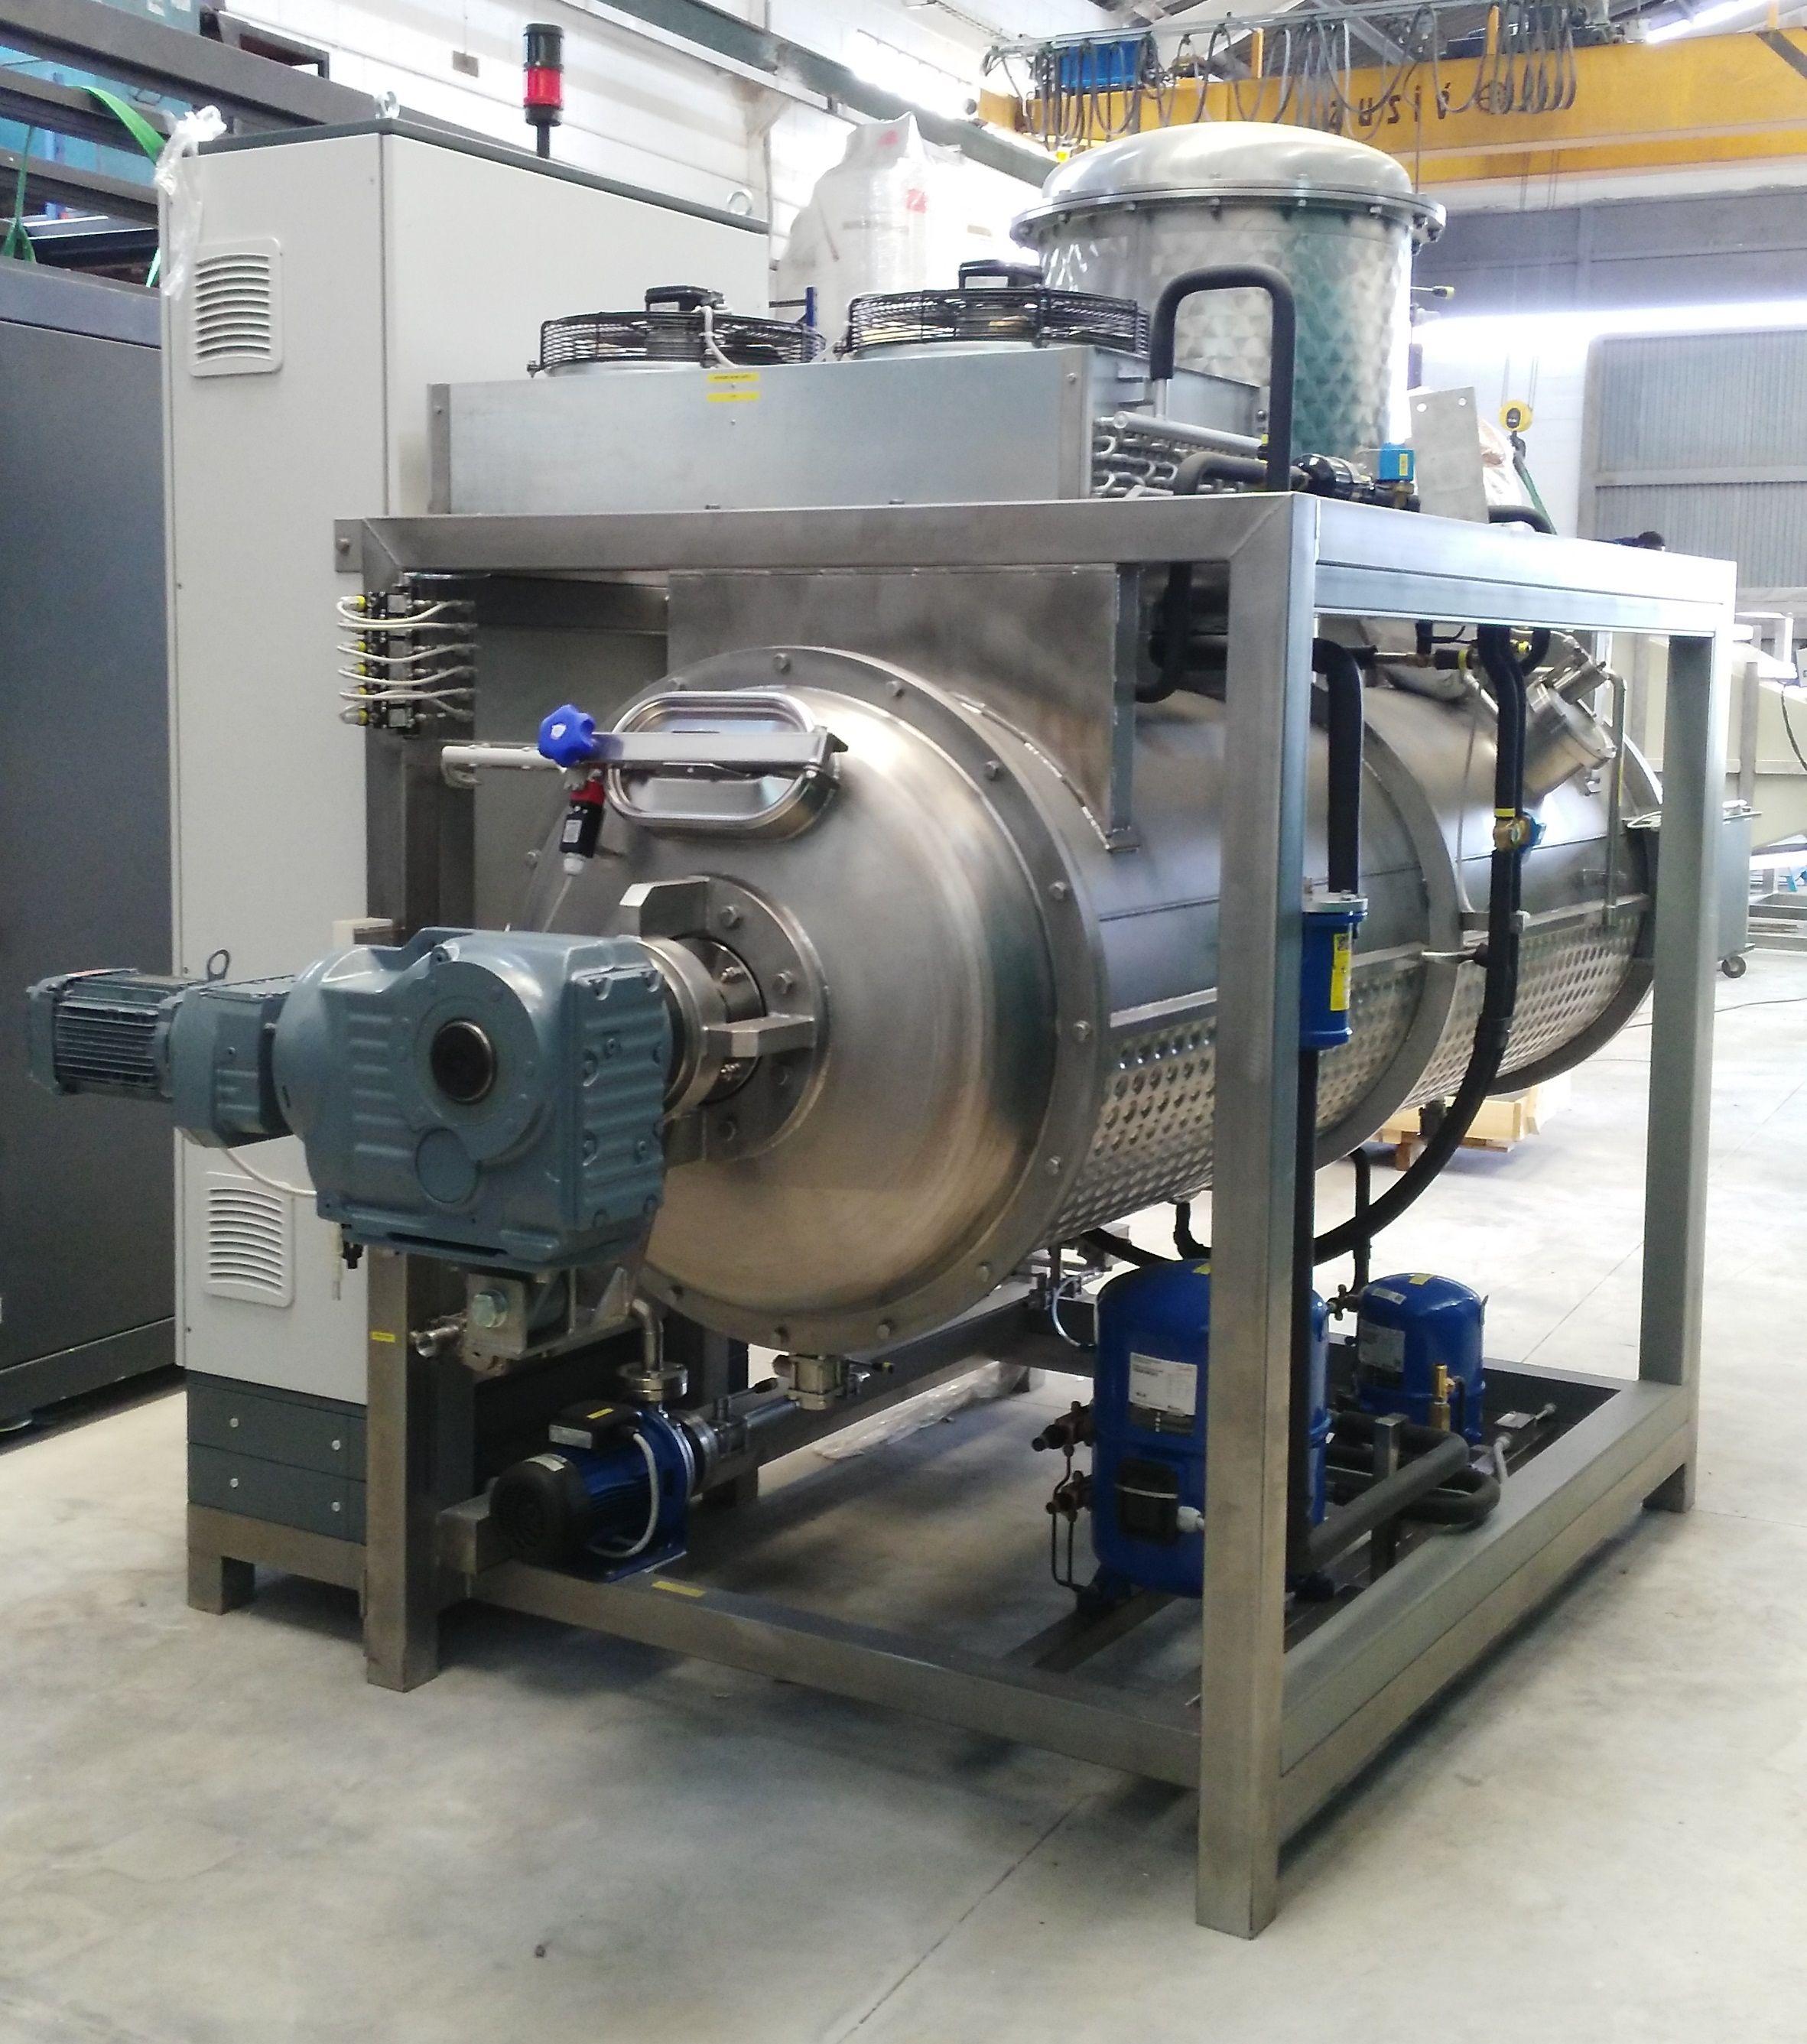 Process Of Salt Crystallization In 2020 Wastewater Treatment Wastewater Treatment